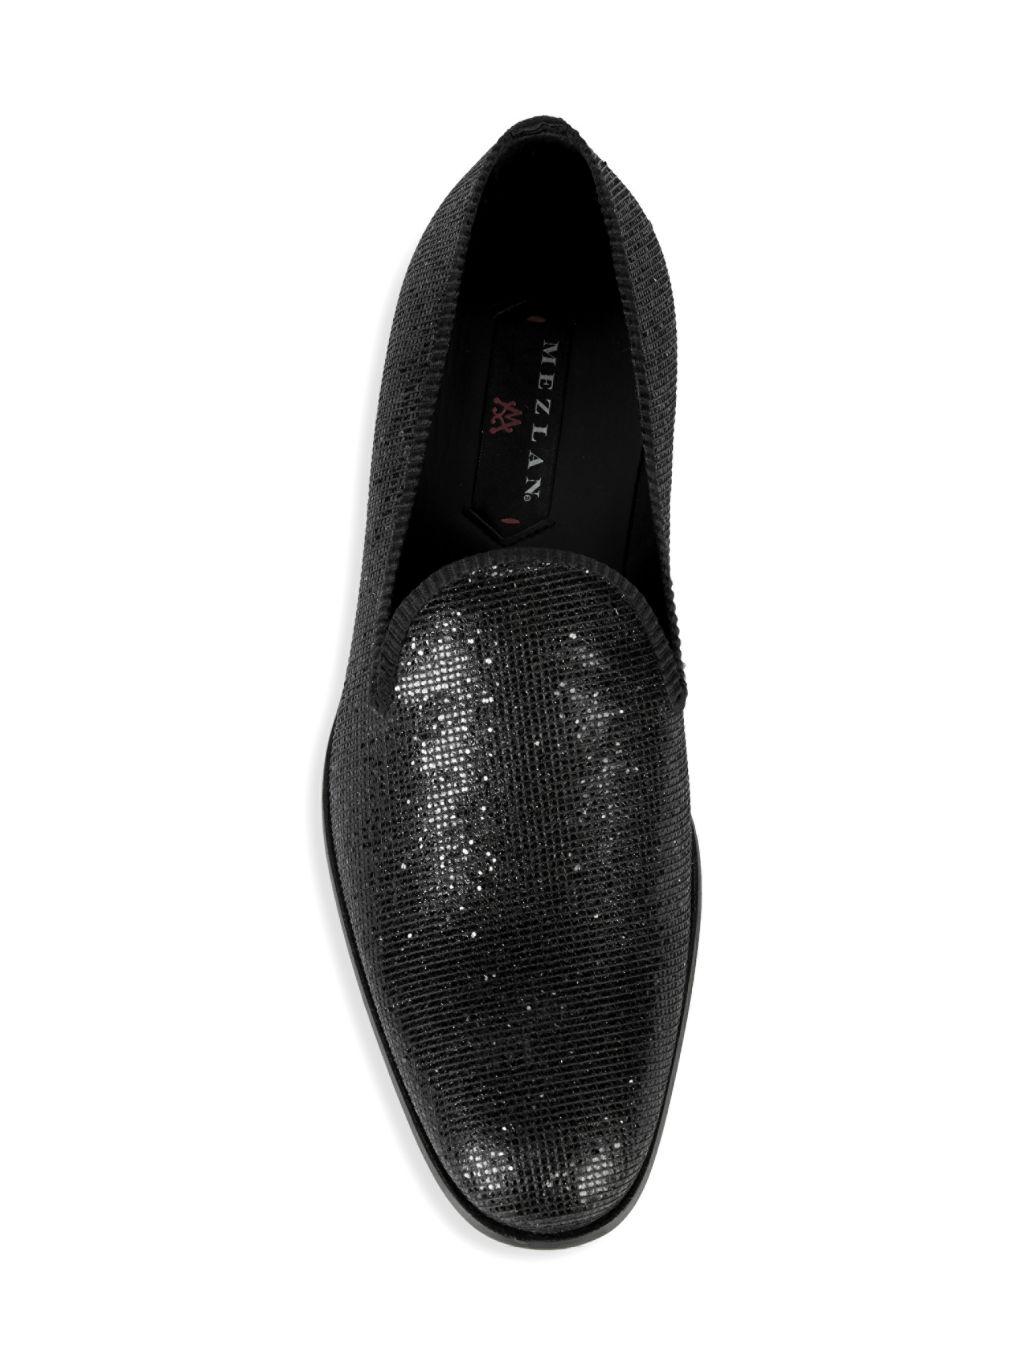 Mezlan Matisse Suede & Textile Loafers